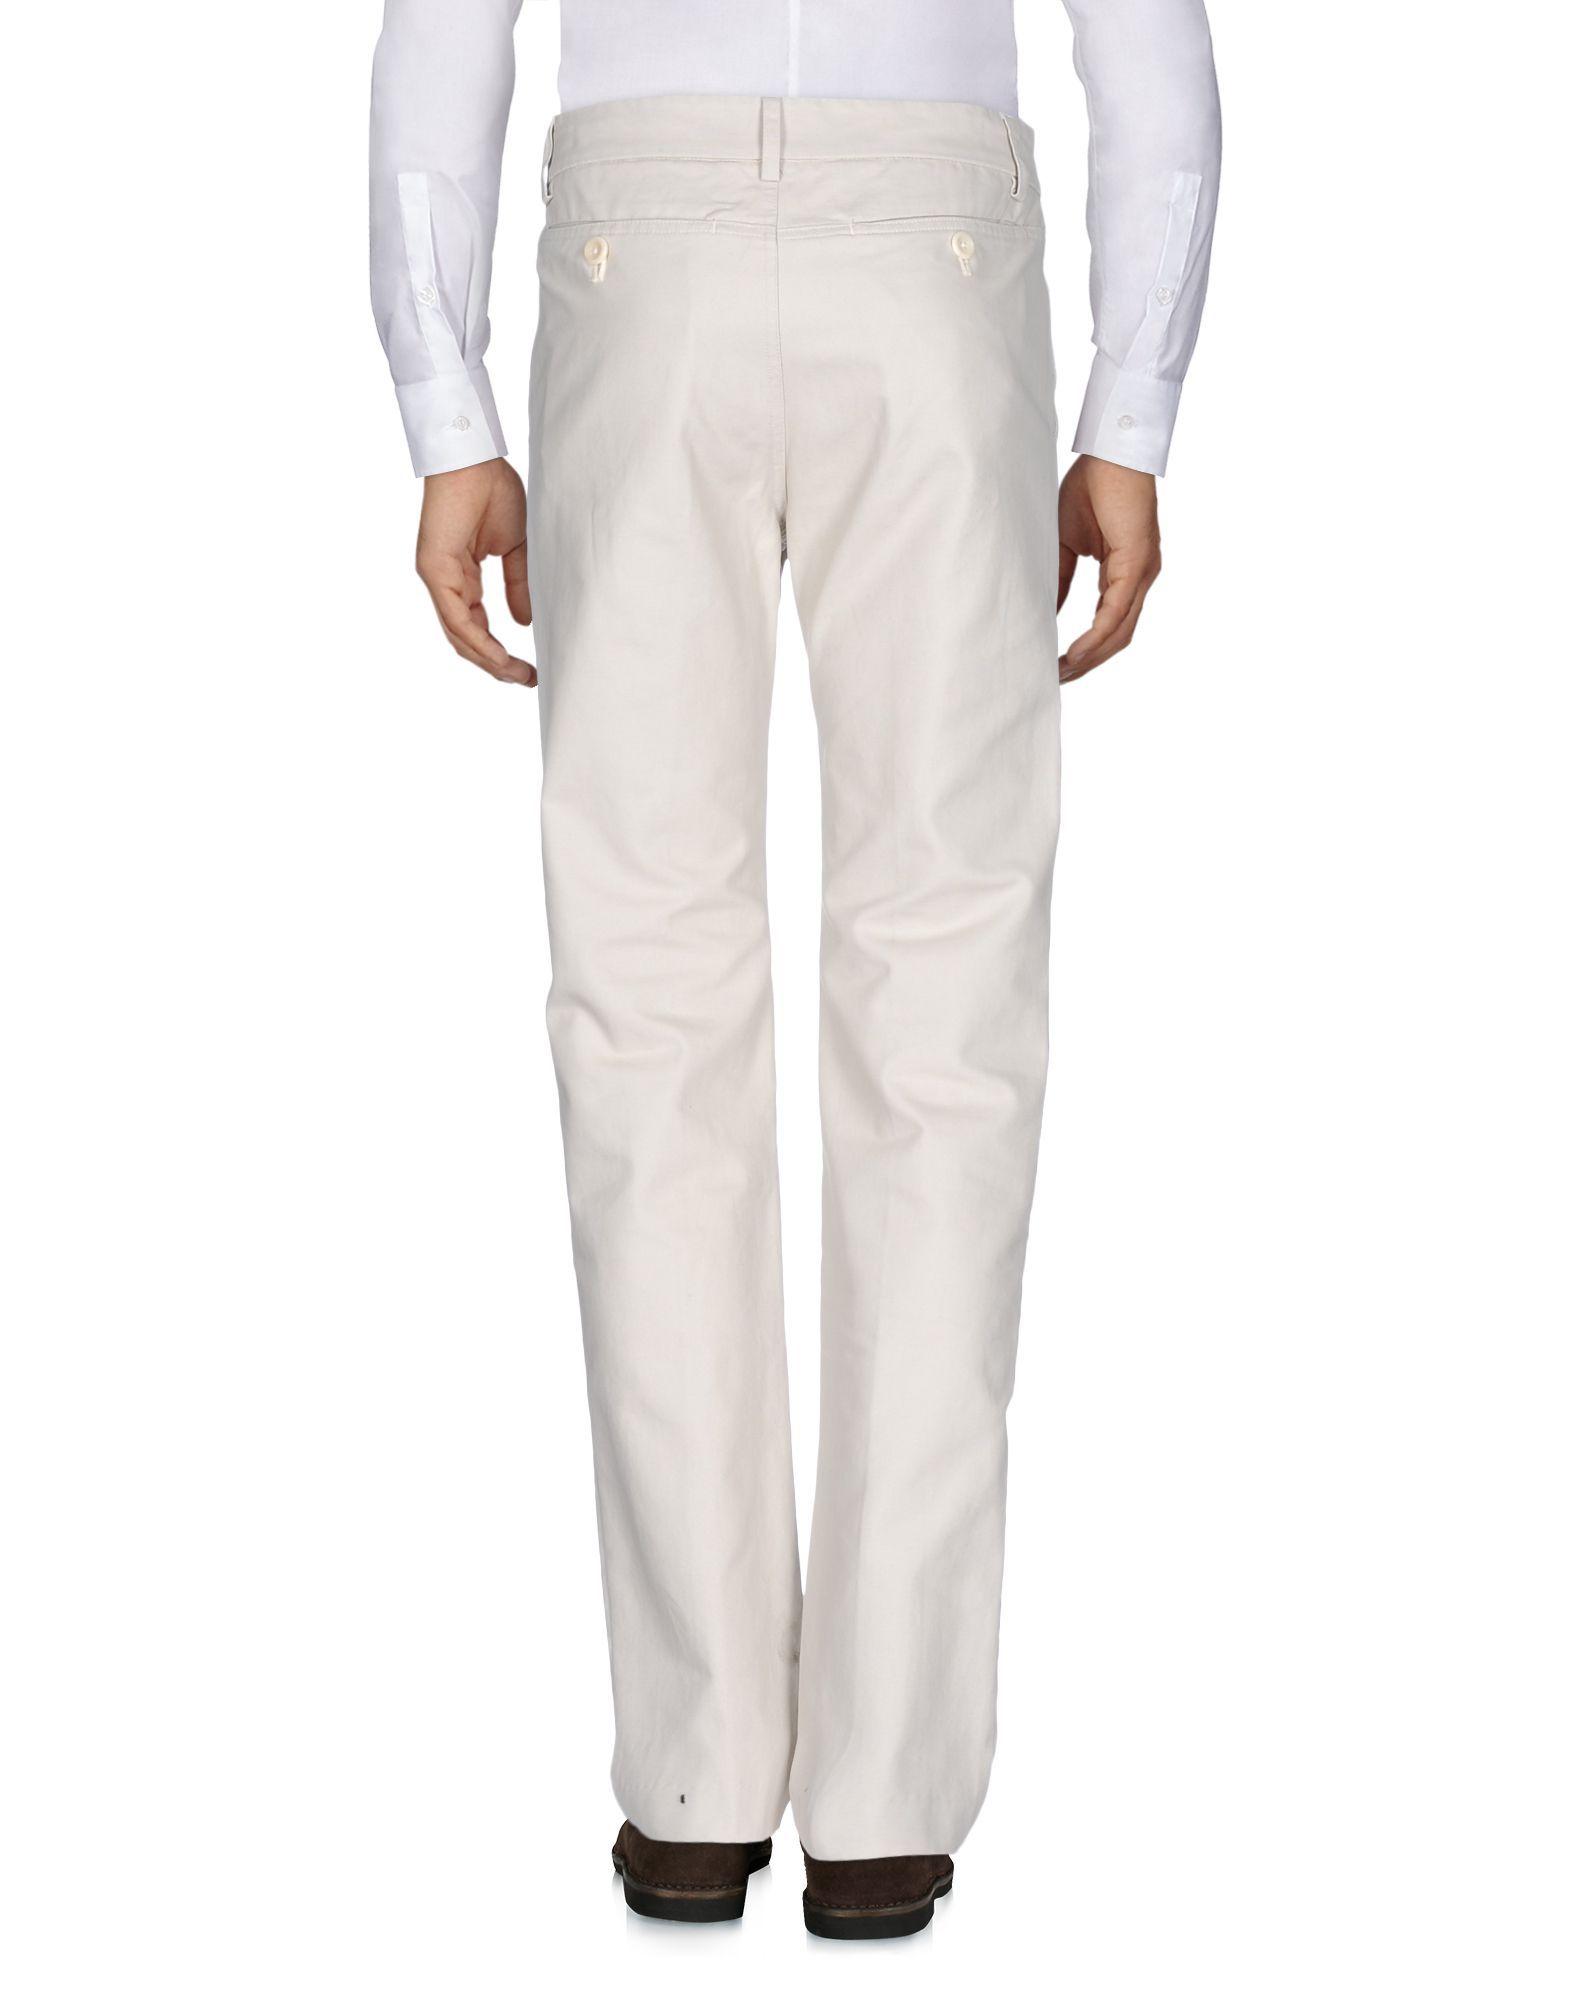 F.S.C. Freemans Sporting Club Sand Cotton Pantaloni